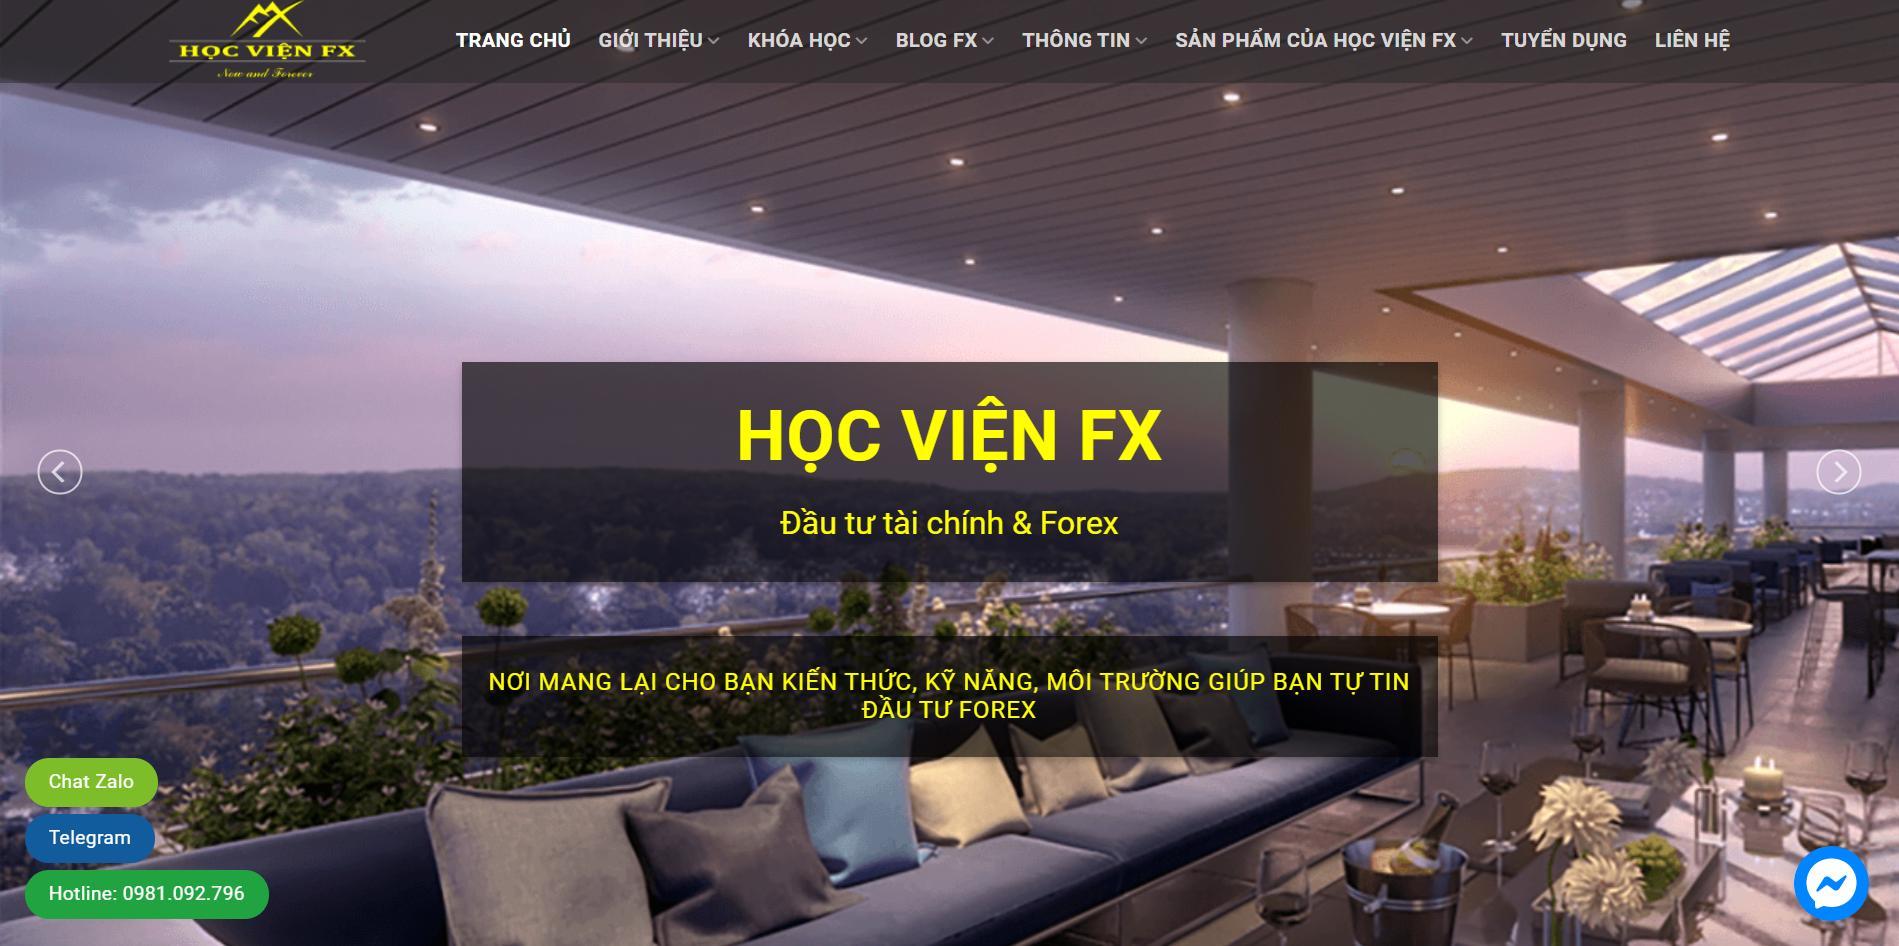 Mẫu web dịch vụ khóa học Forex